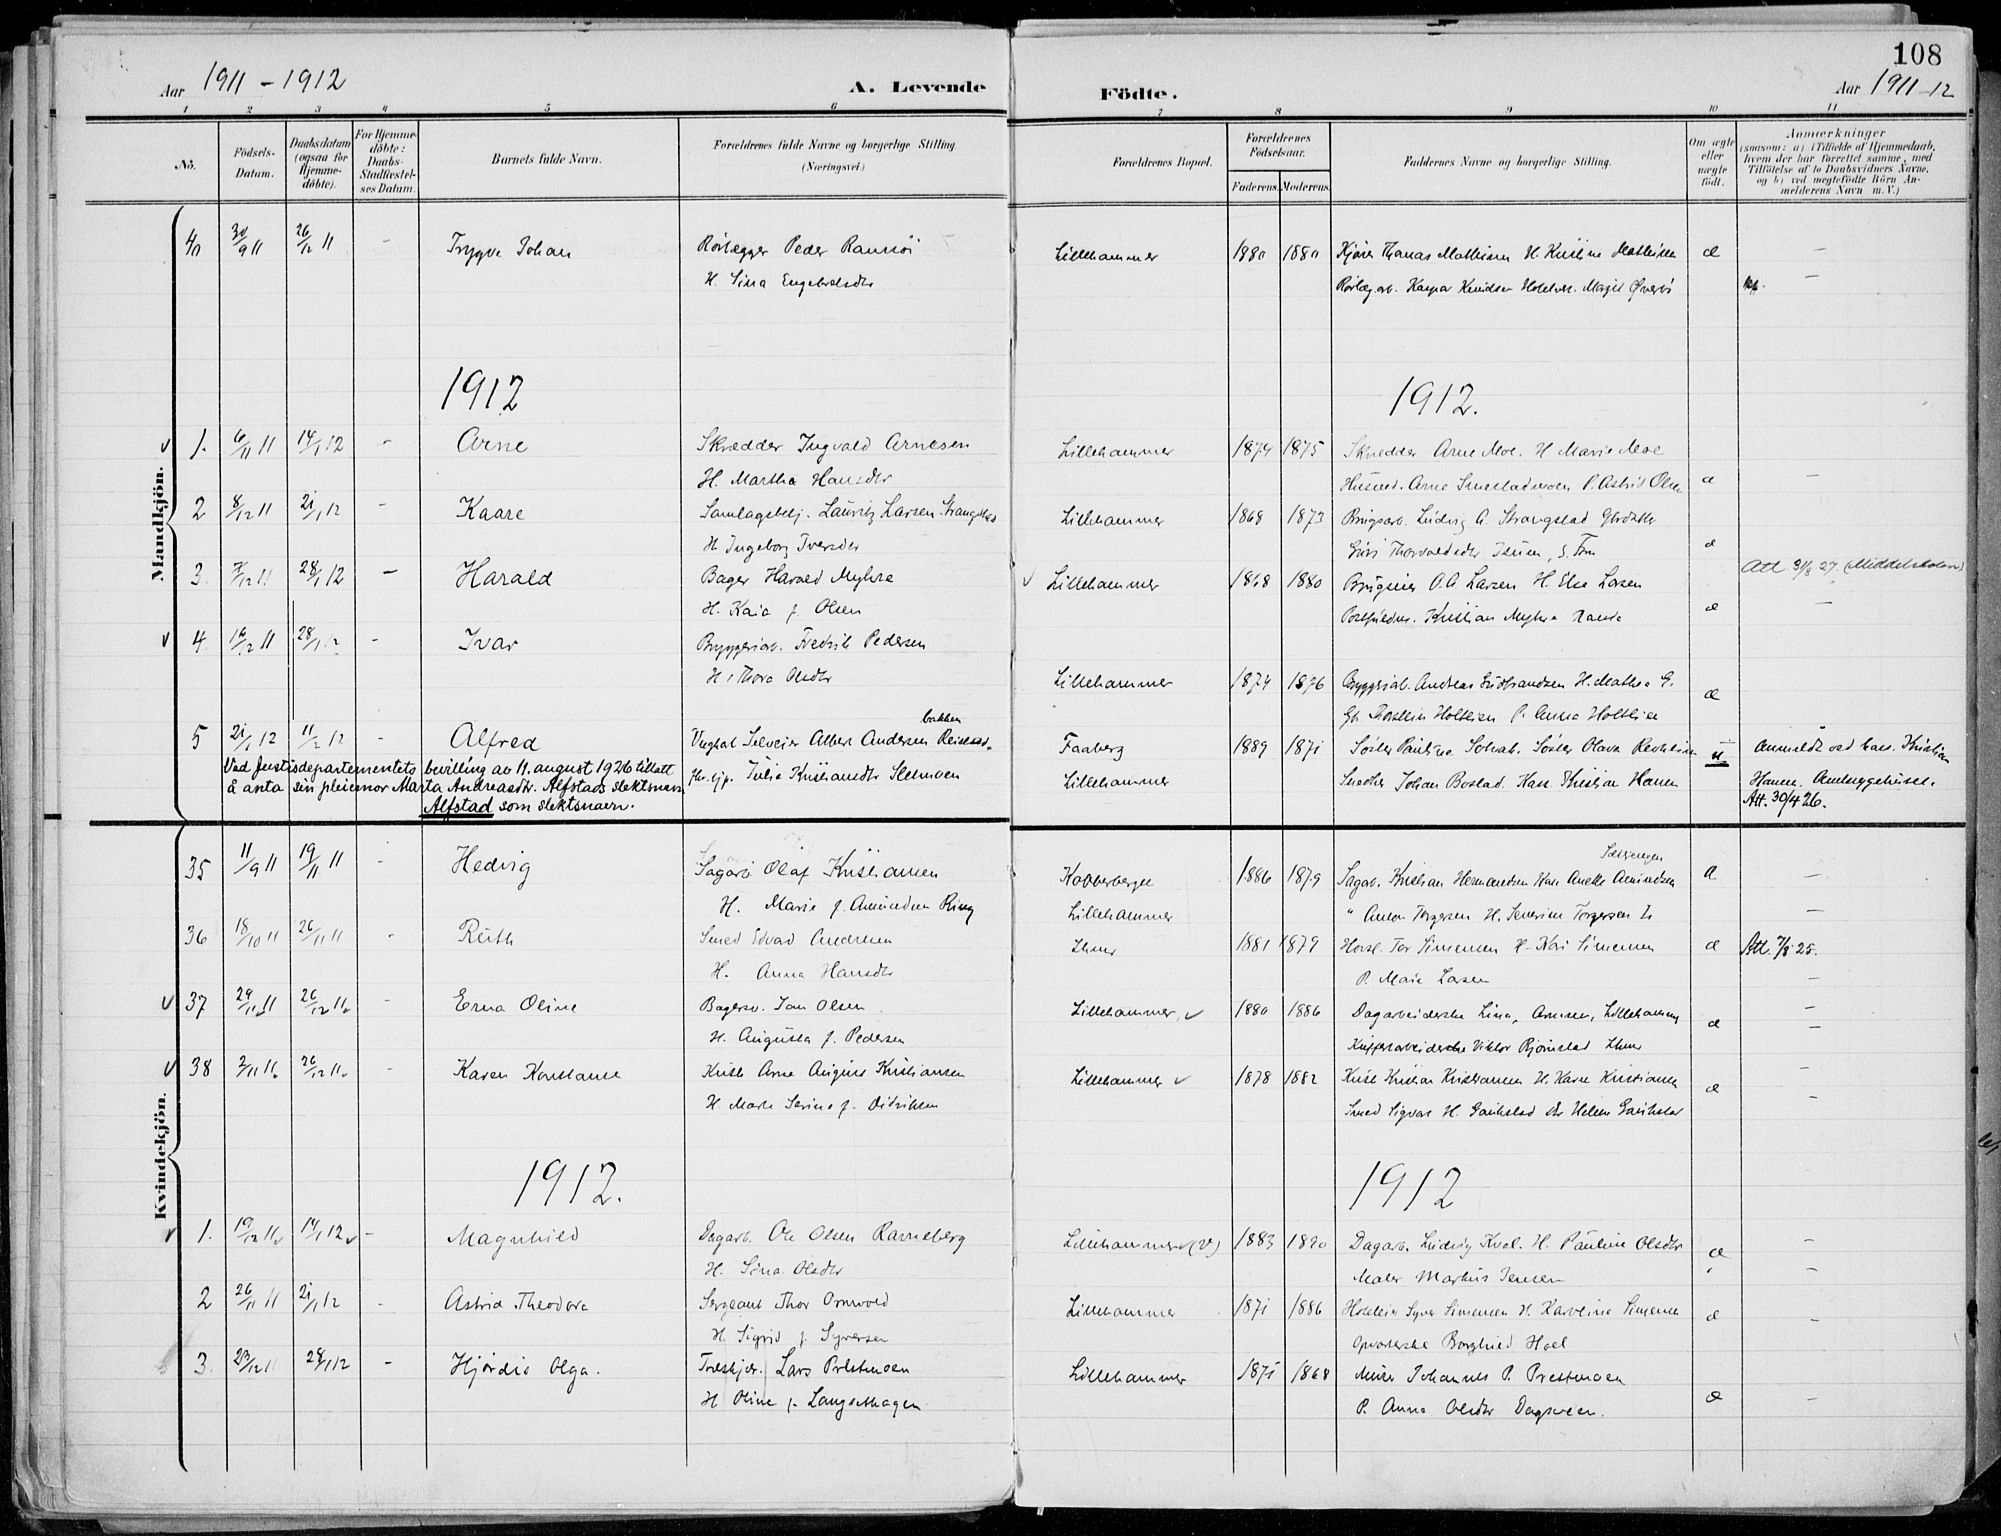 SAH, Lillehammer prestekontor, Ministerialbok nr. 1, 1901-1916, s. 108